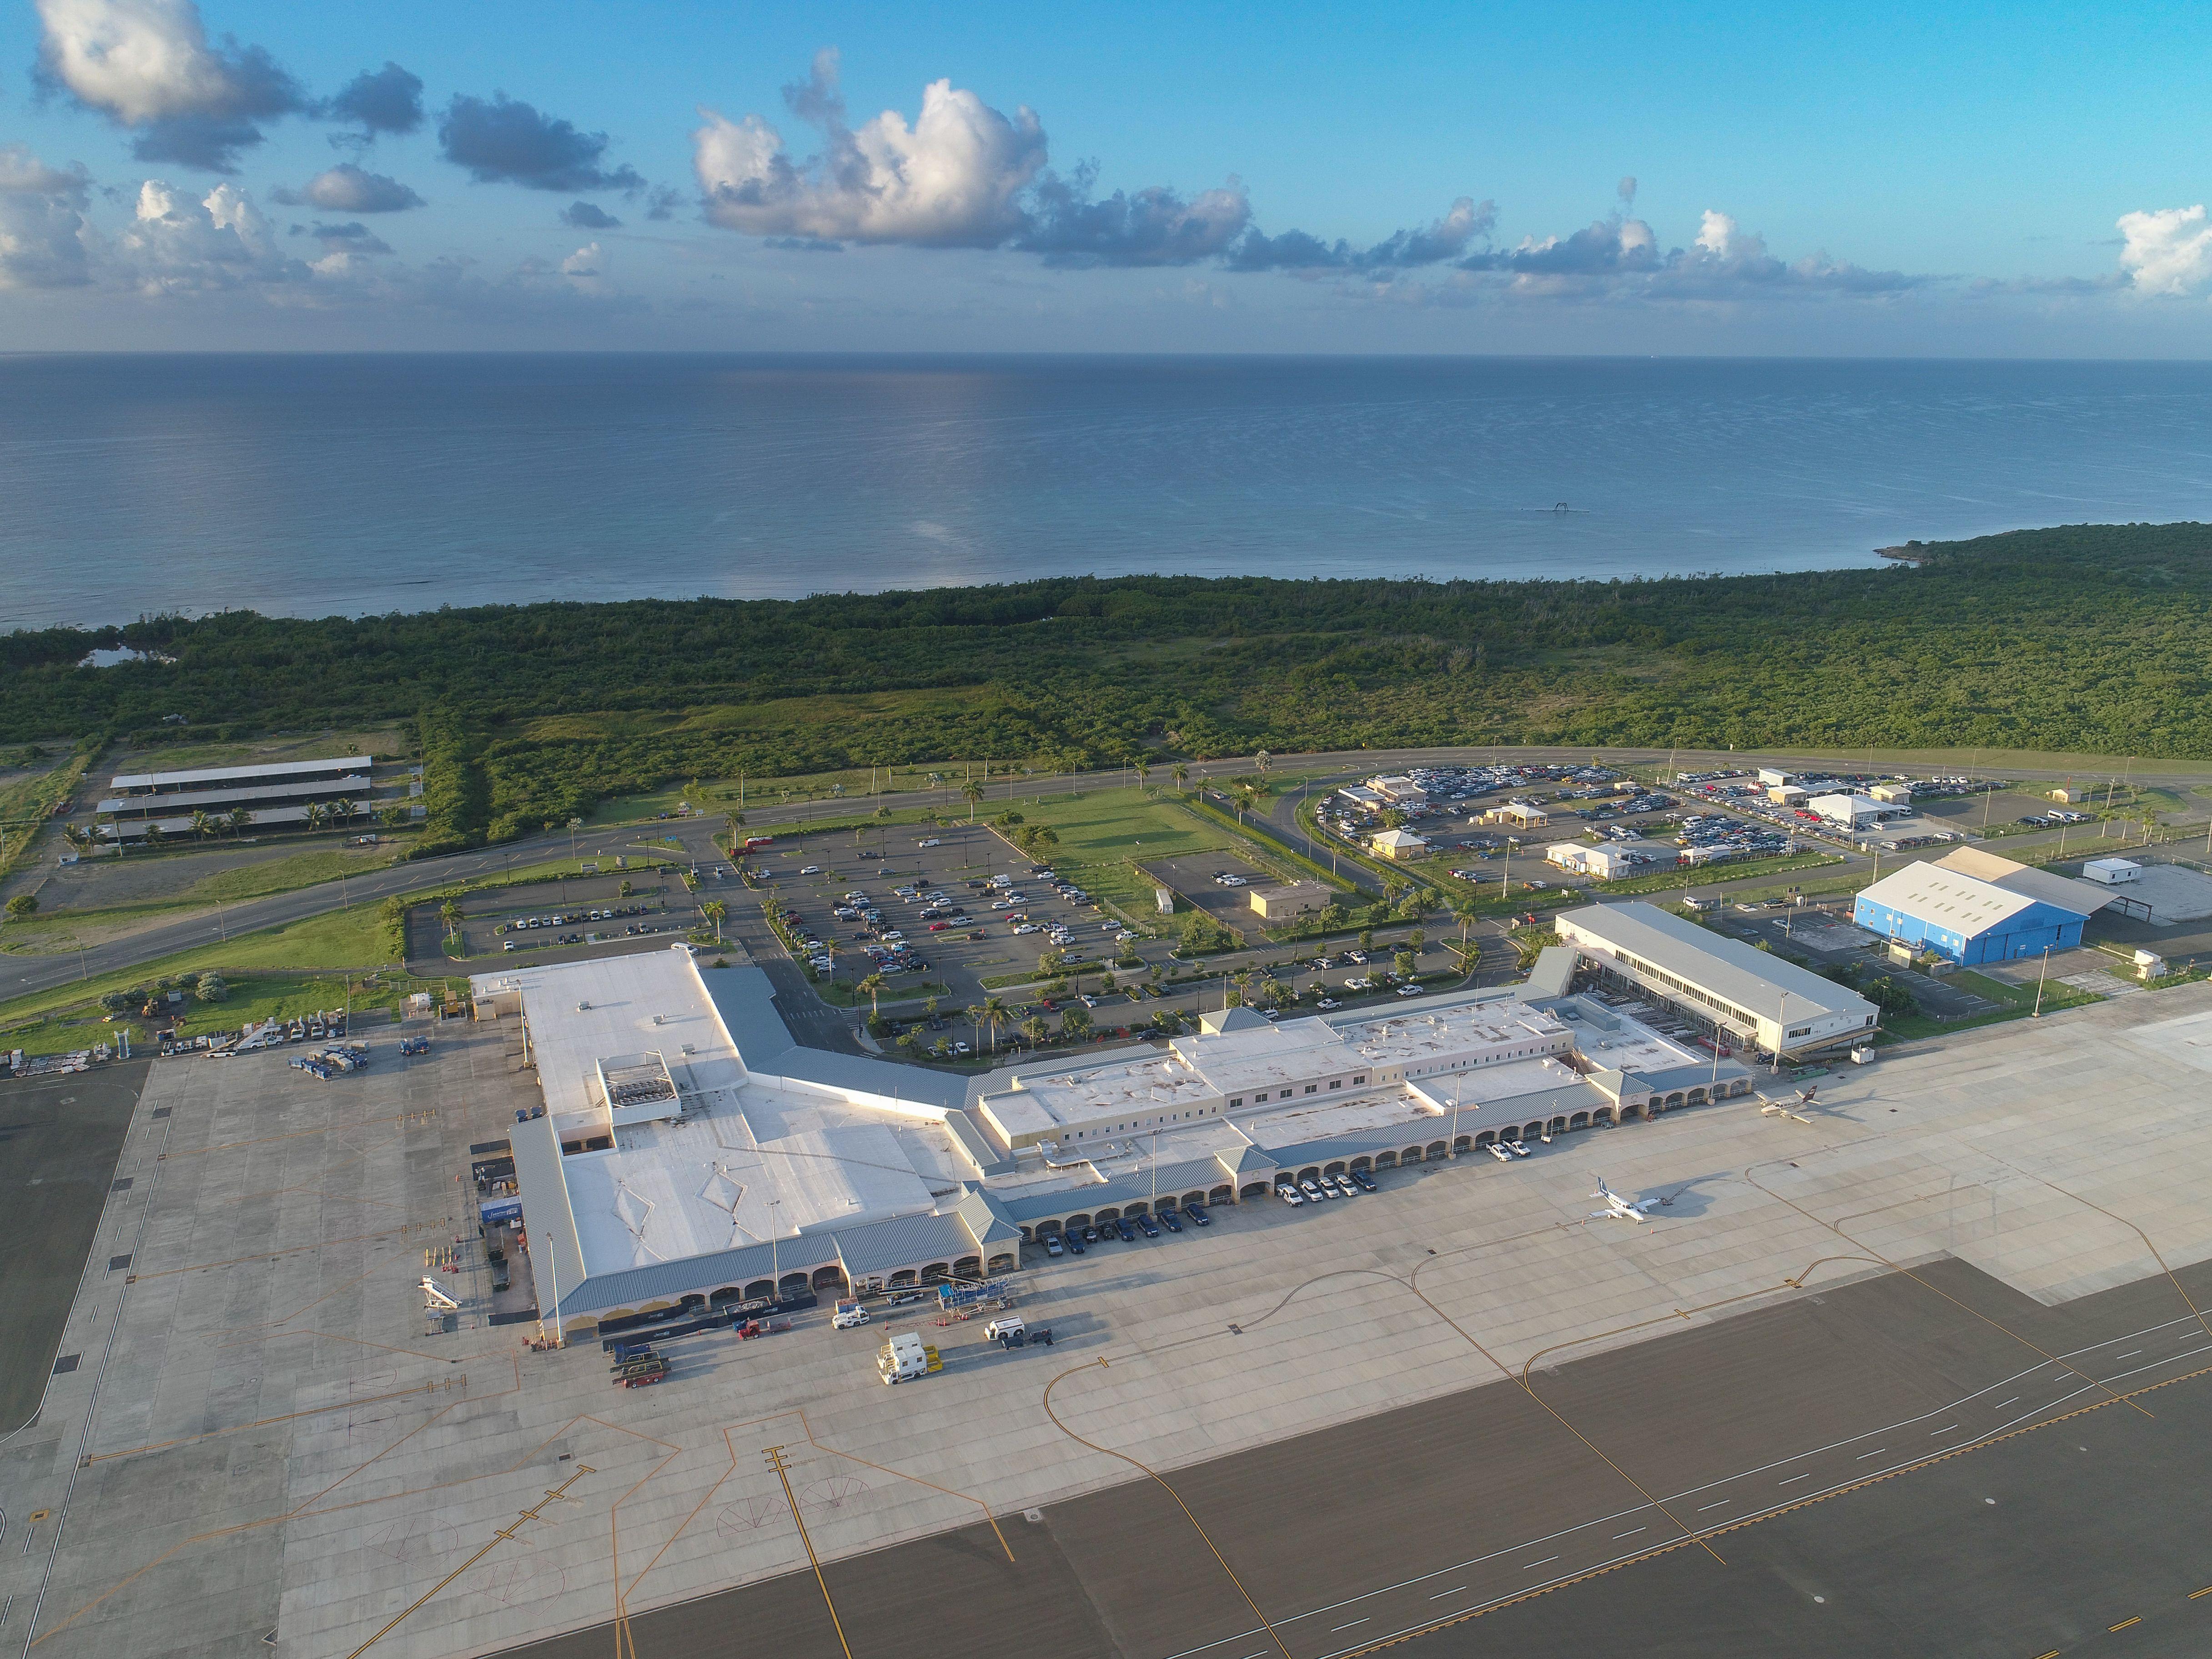 Henry E. Rohlsen Airport, St. Croix